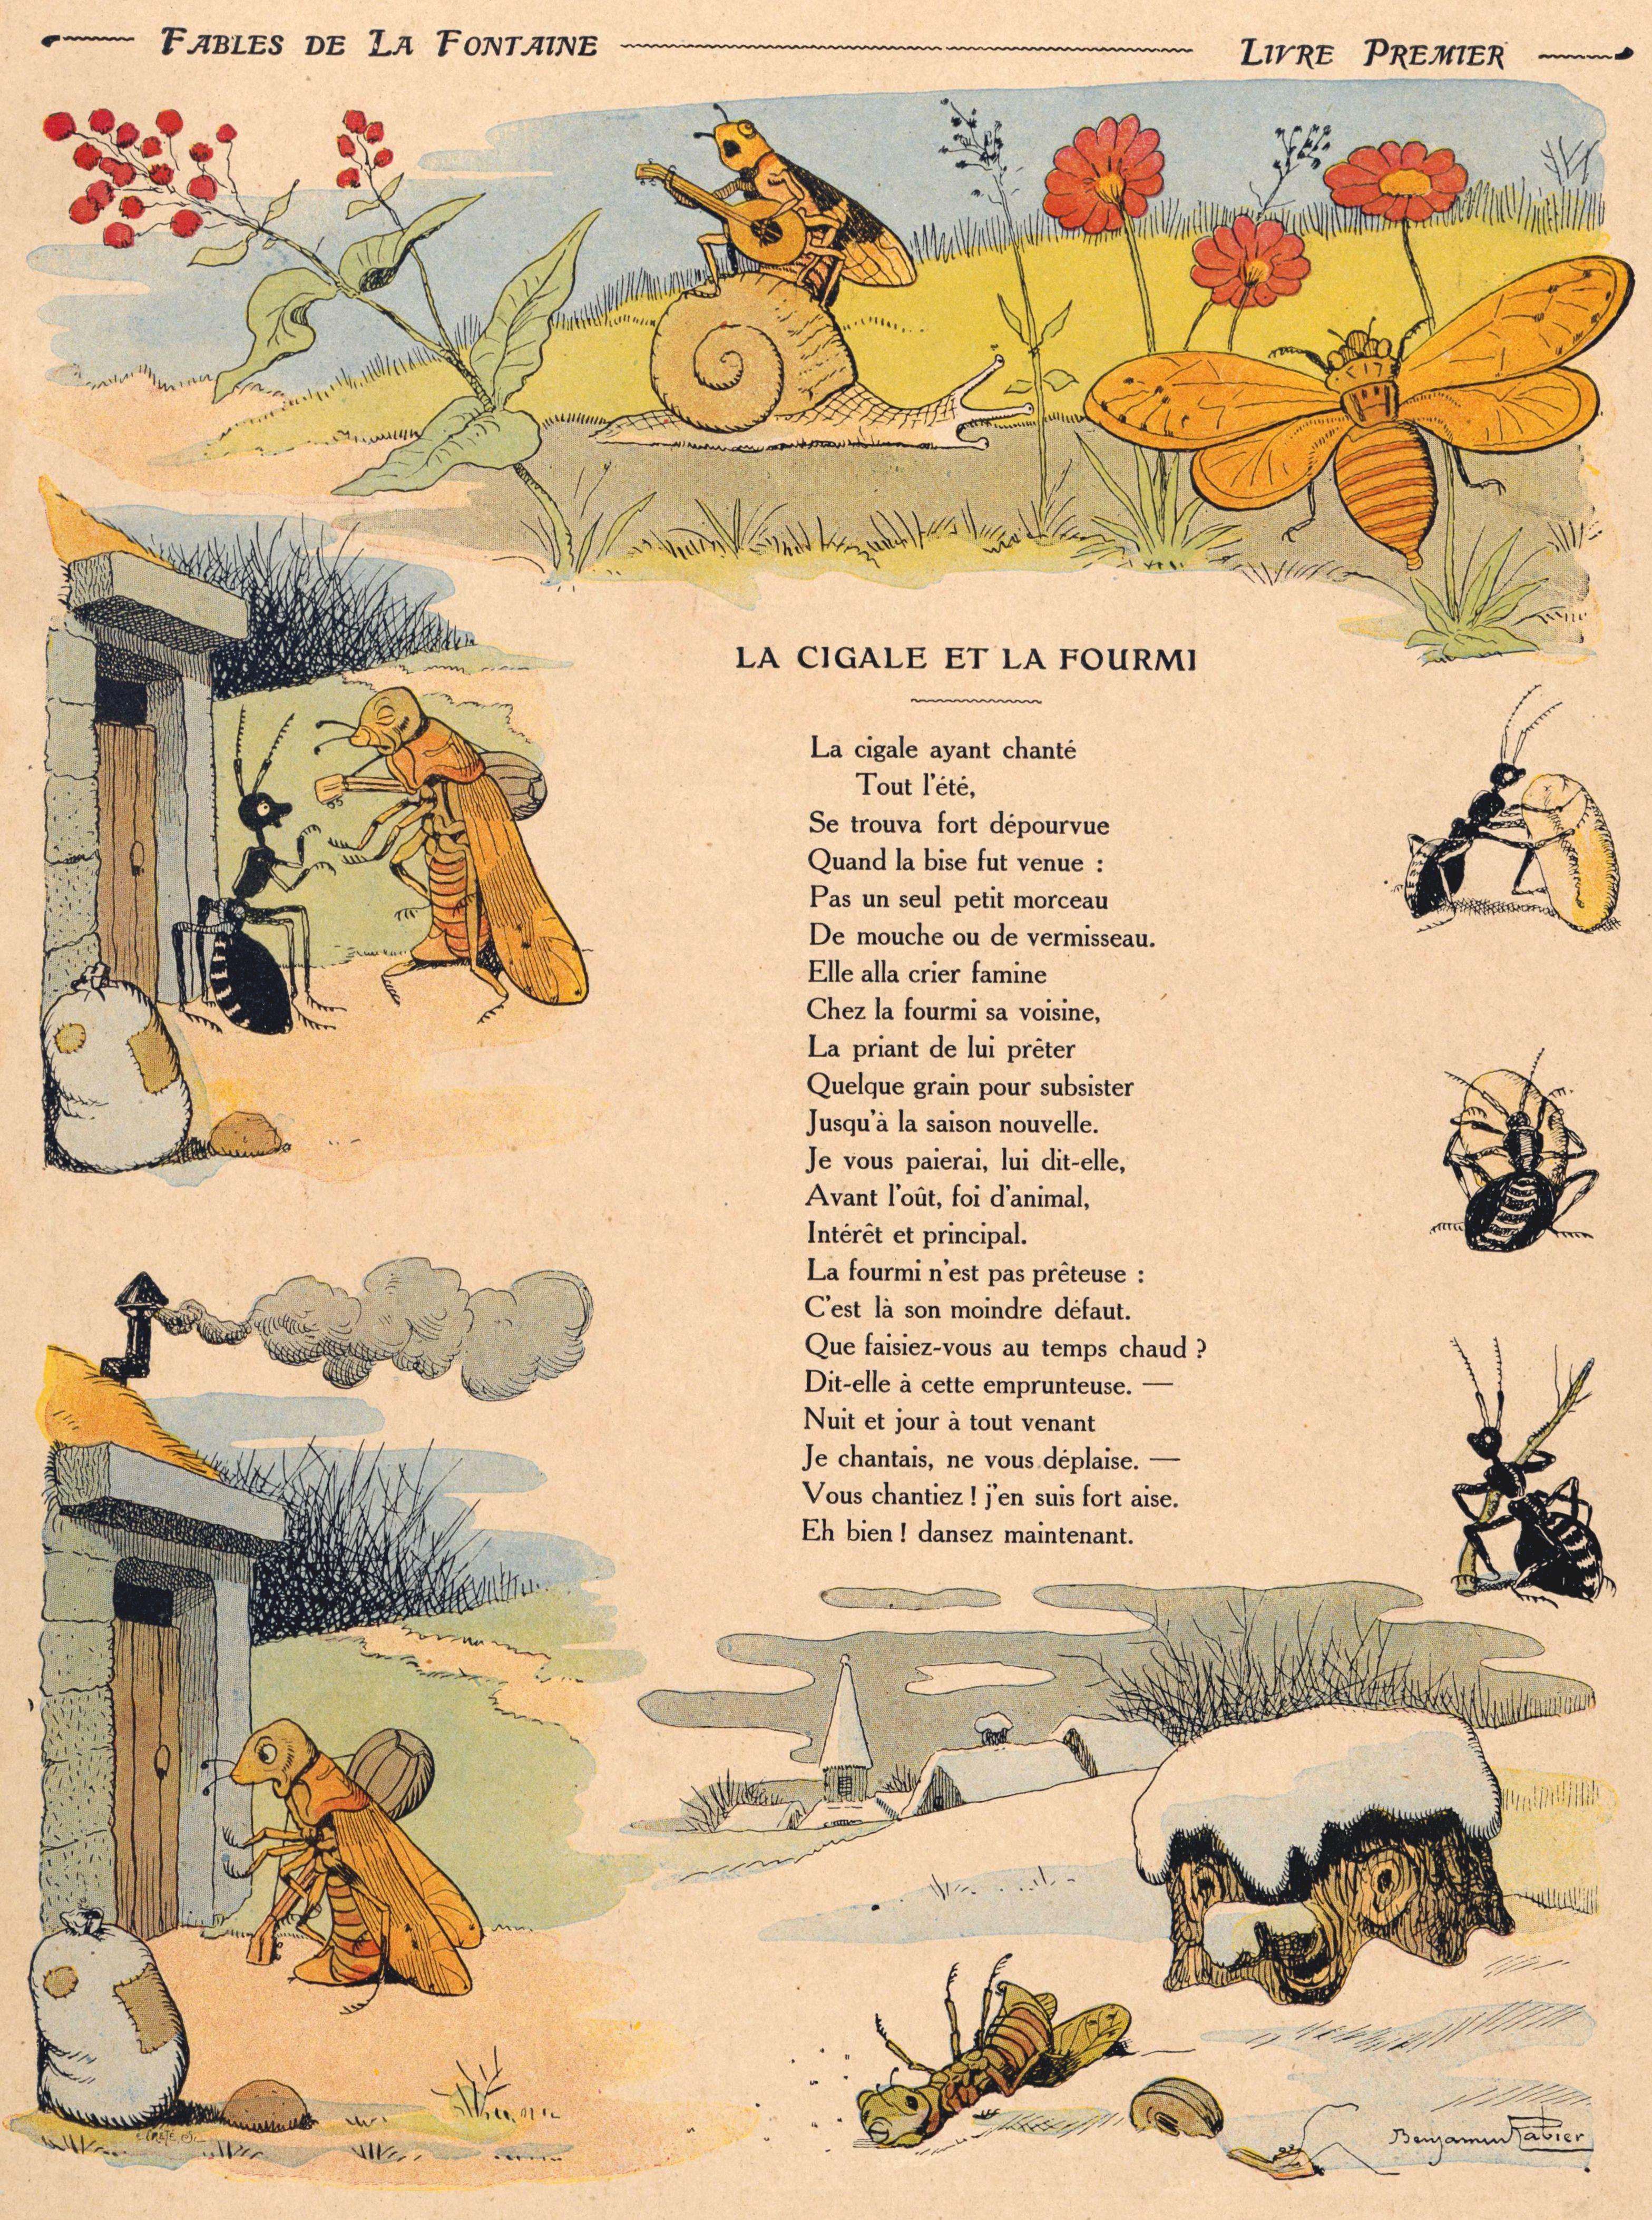 Image La Cigale Et La Fourmi : image, cigale, fourmi, File:Fables-01-cigale.jpg, Wikimedia, Commons